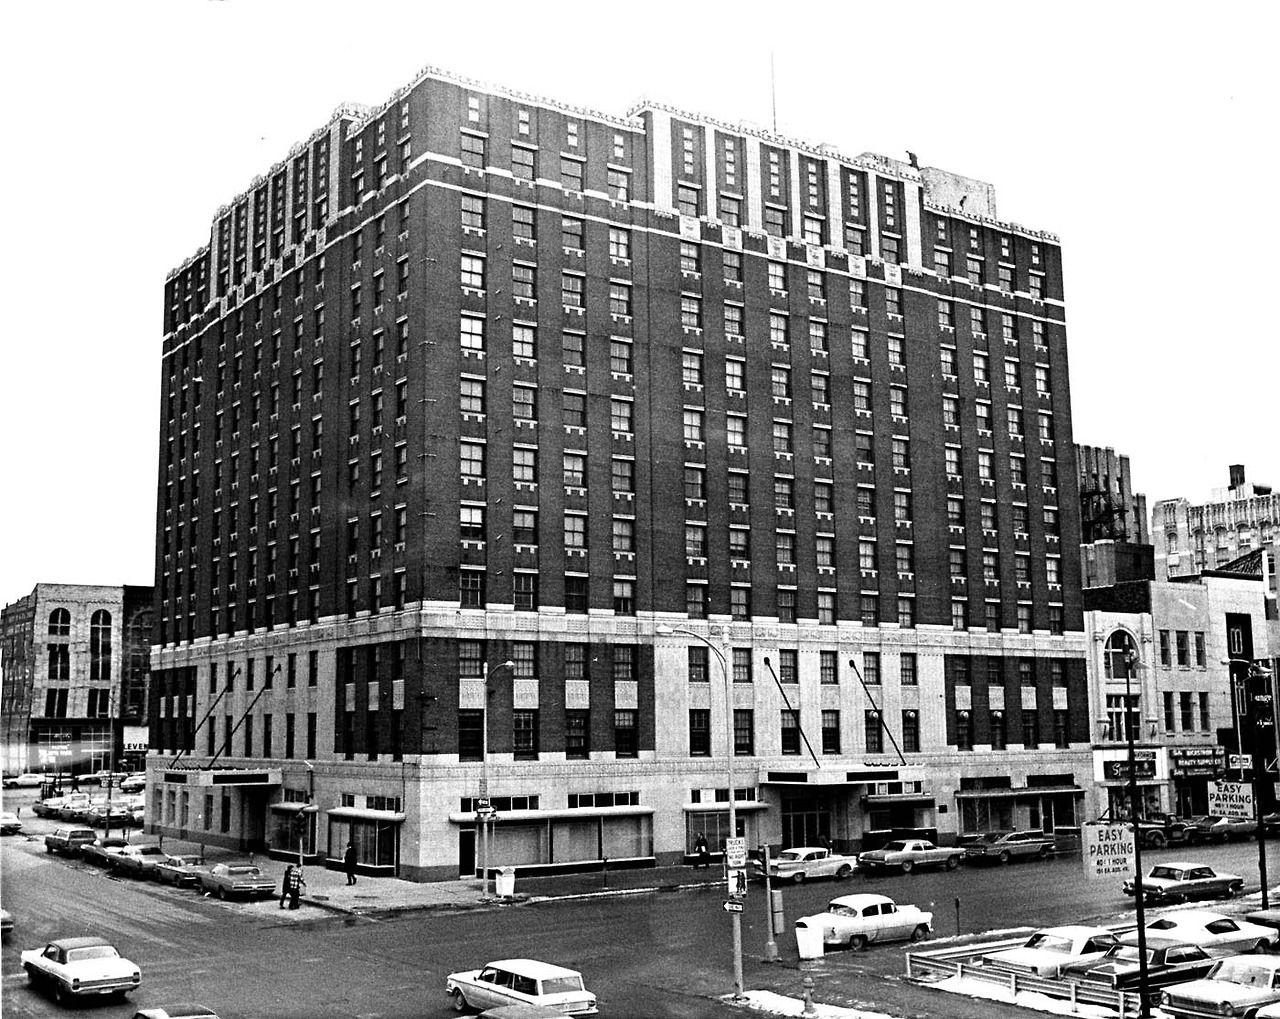 A View Of The Paxton Hotel 1403 Farnam St In Omaha Taken In February 1971 The World Herald Omaha Nebraska Nebraska Omaha